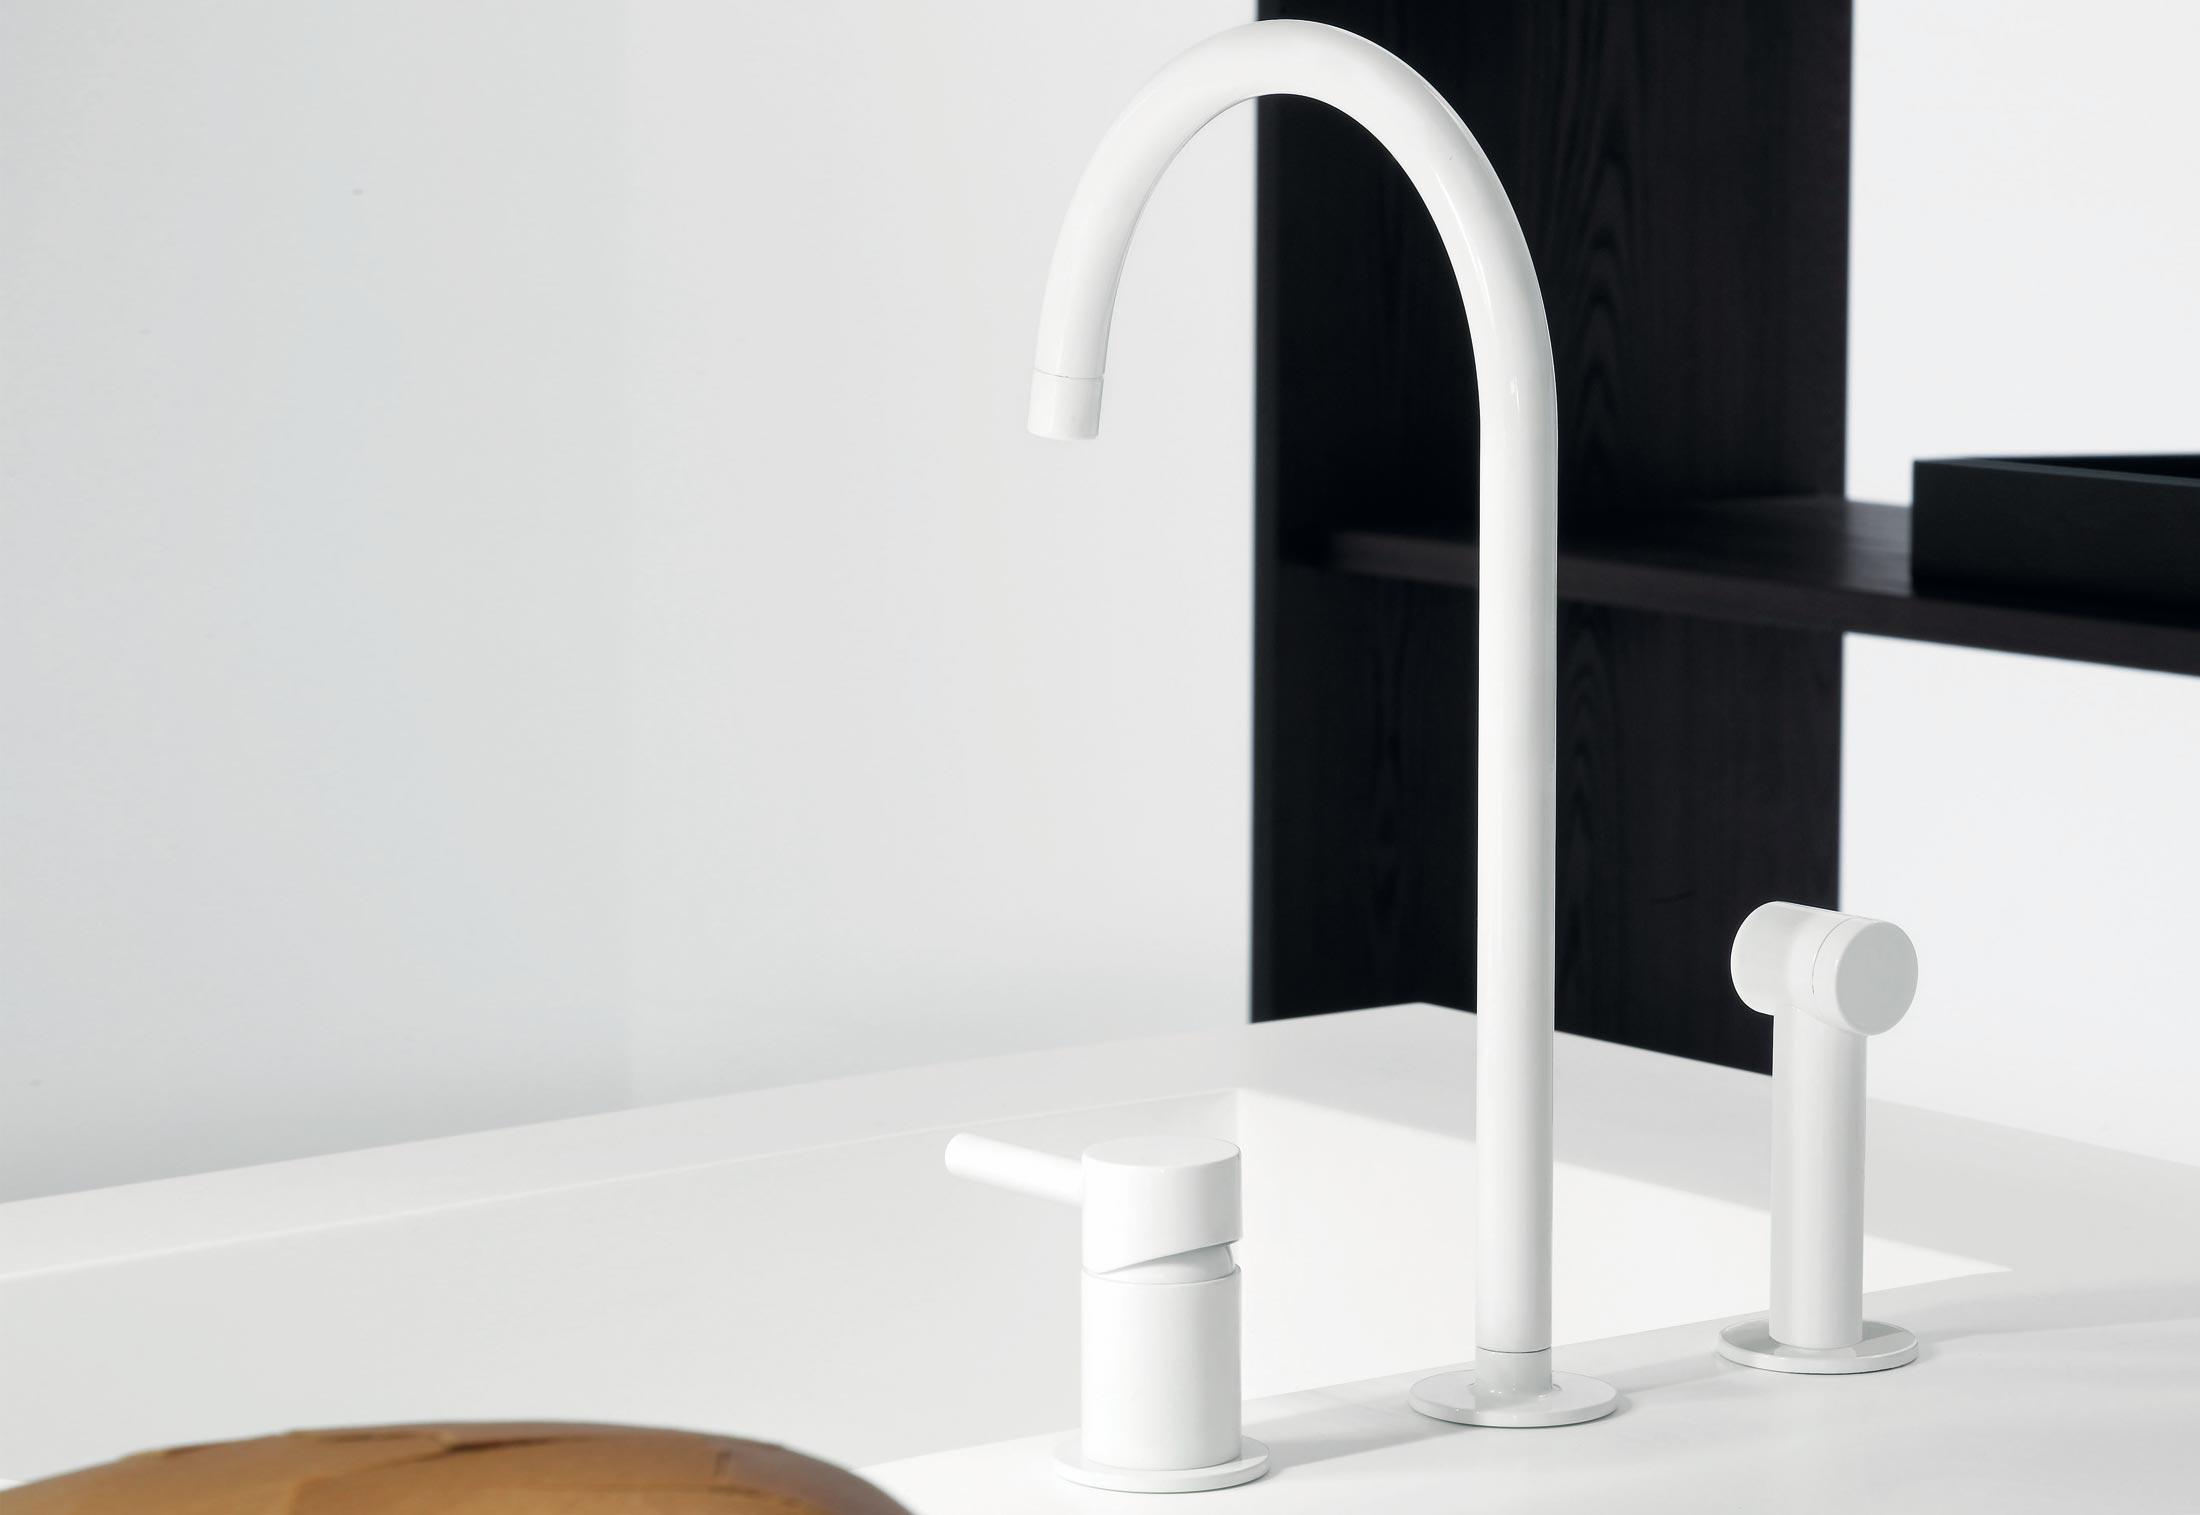 Pan Zp6278 By Zucchetti Stylepark - Colorful-kitchen-faucets-from-zucchetti